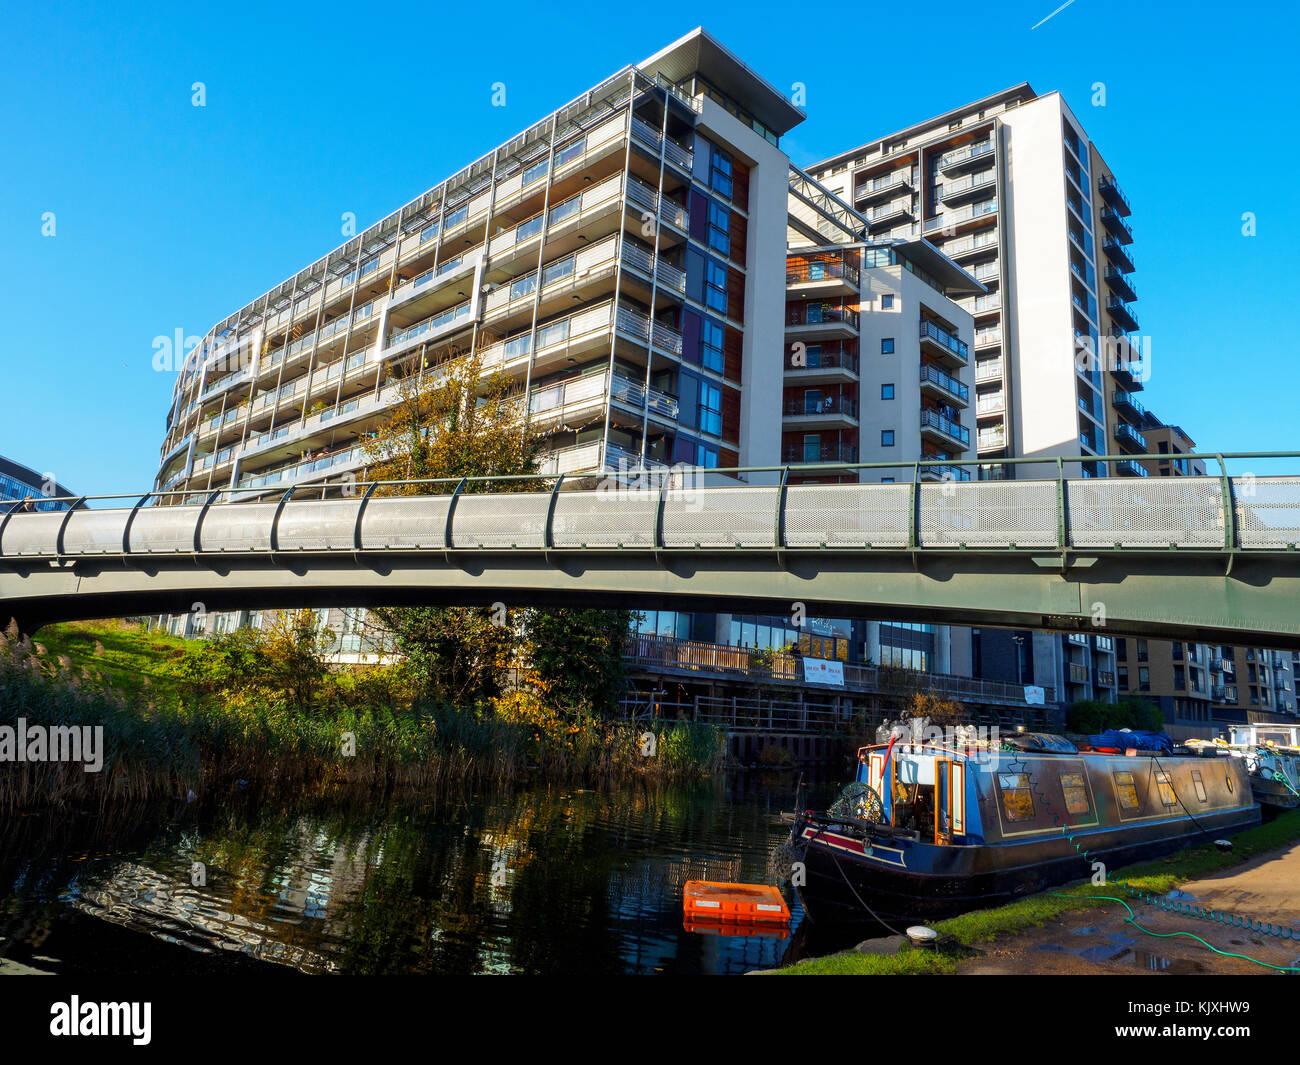 Modern Apartment Building London Stock Photos & Modern ...